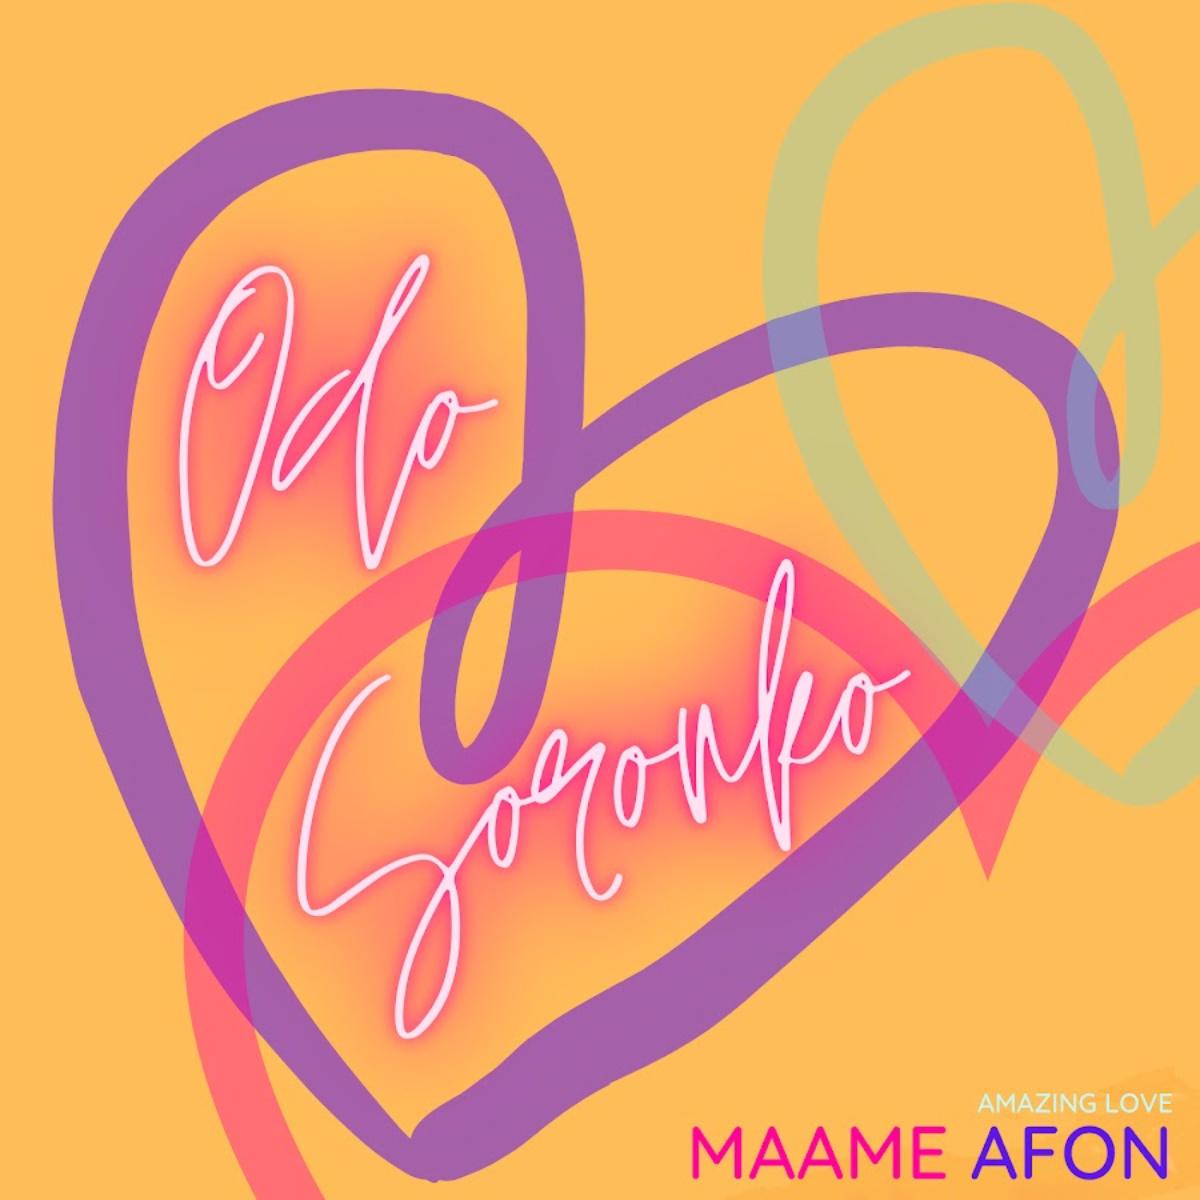 Odo Soronko by Maame Afon